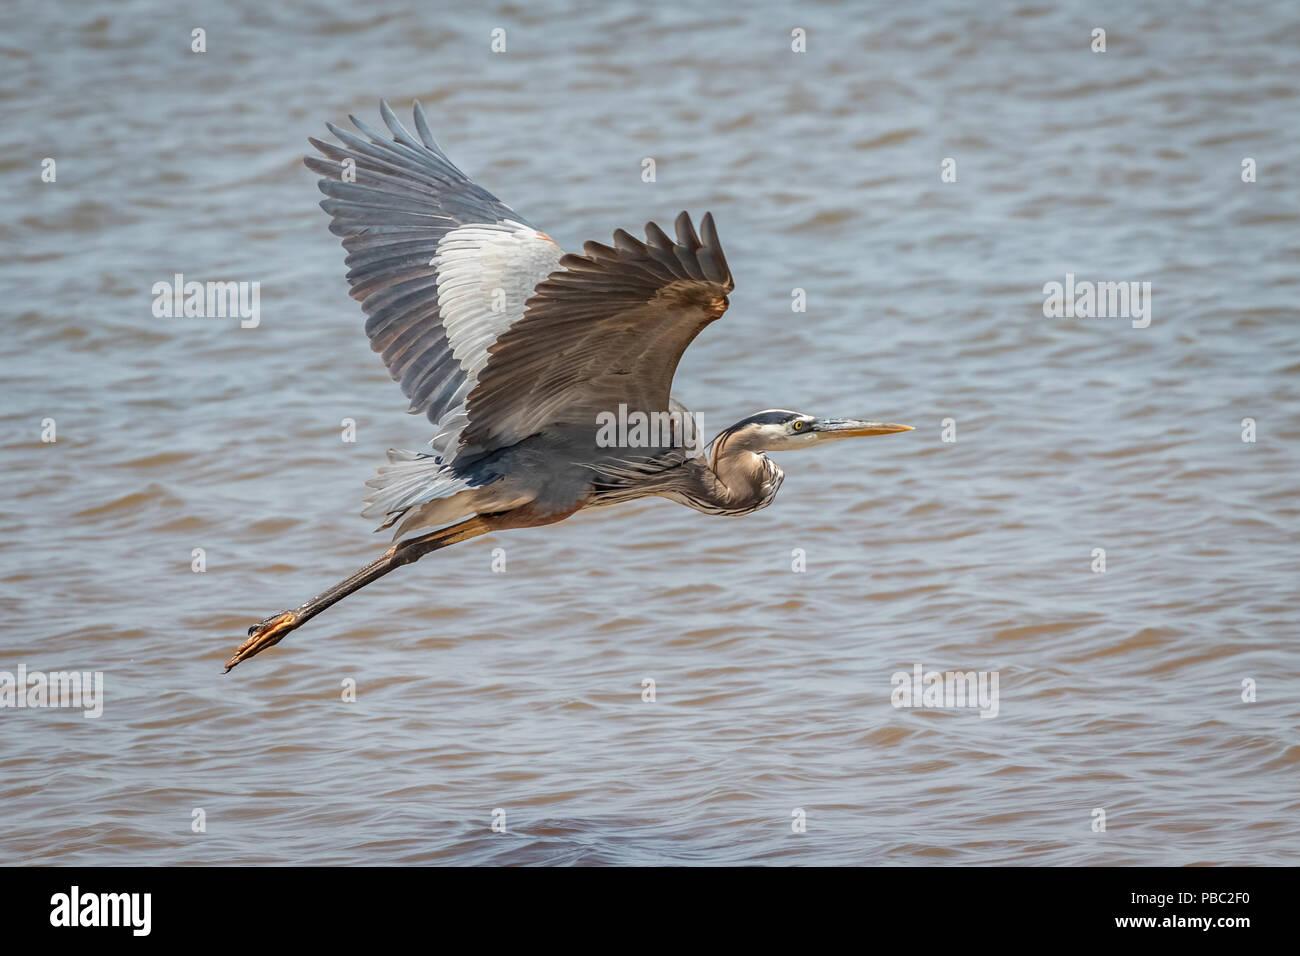 Great Blue Heron (Ardea herodias) in flight. - Stock Image